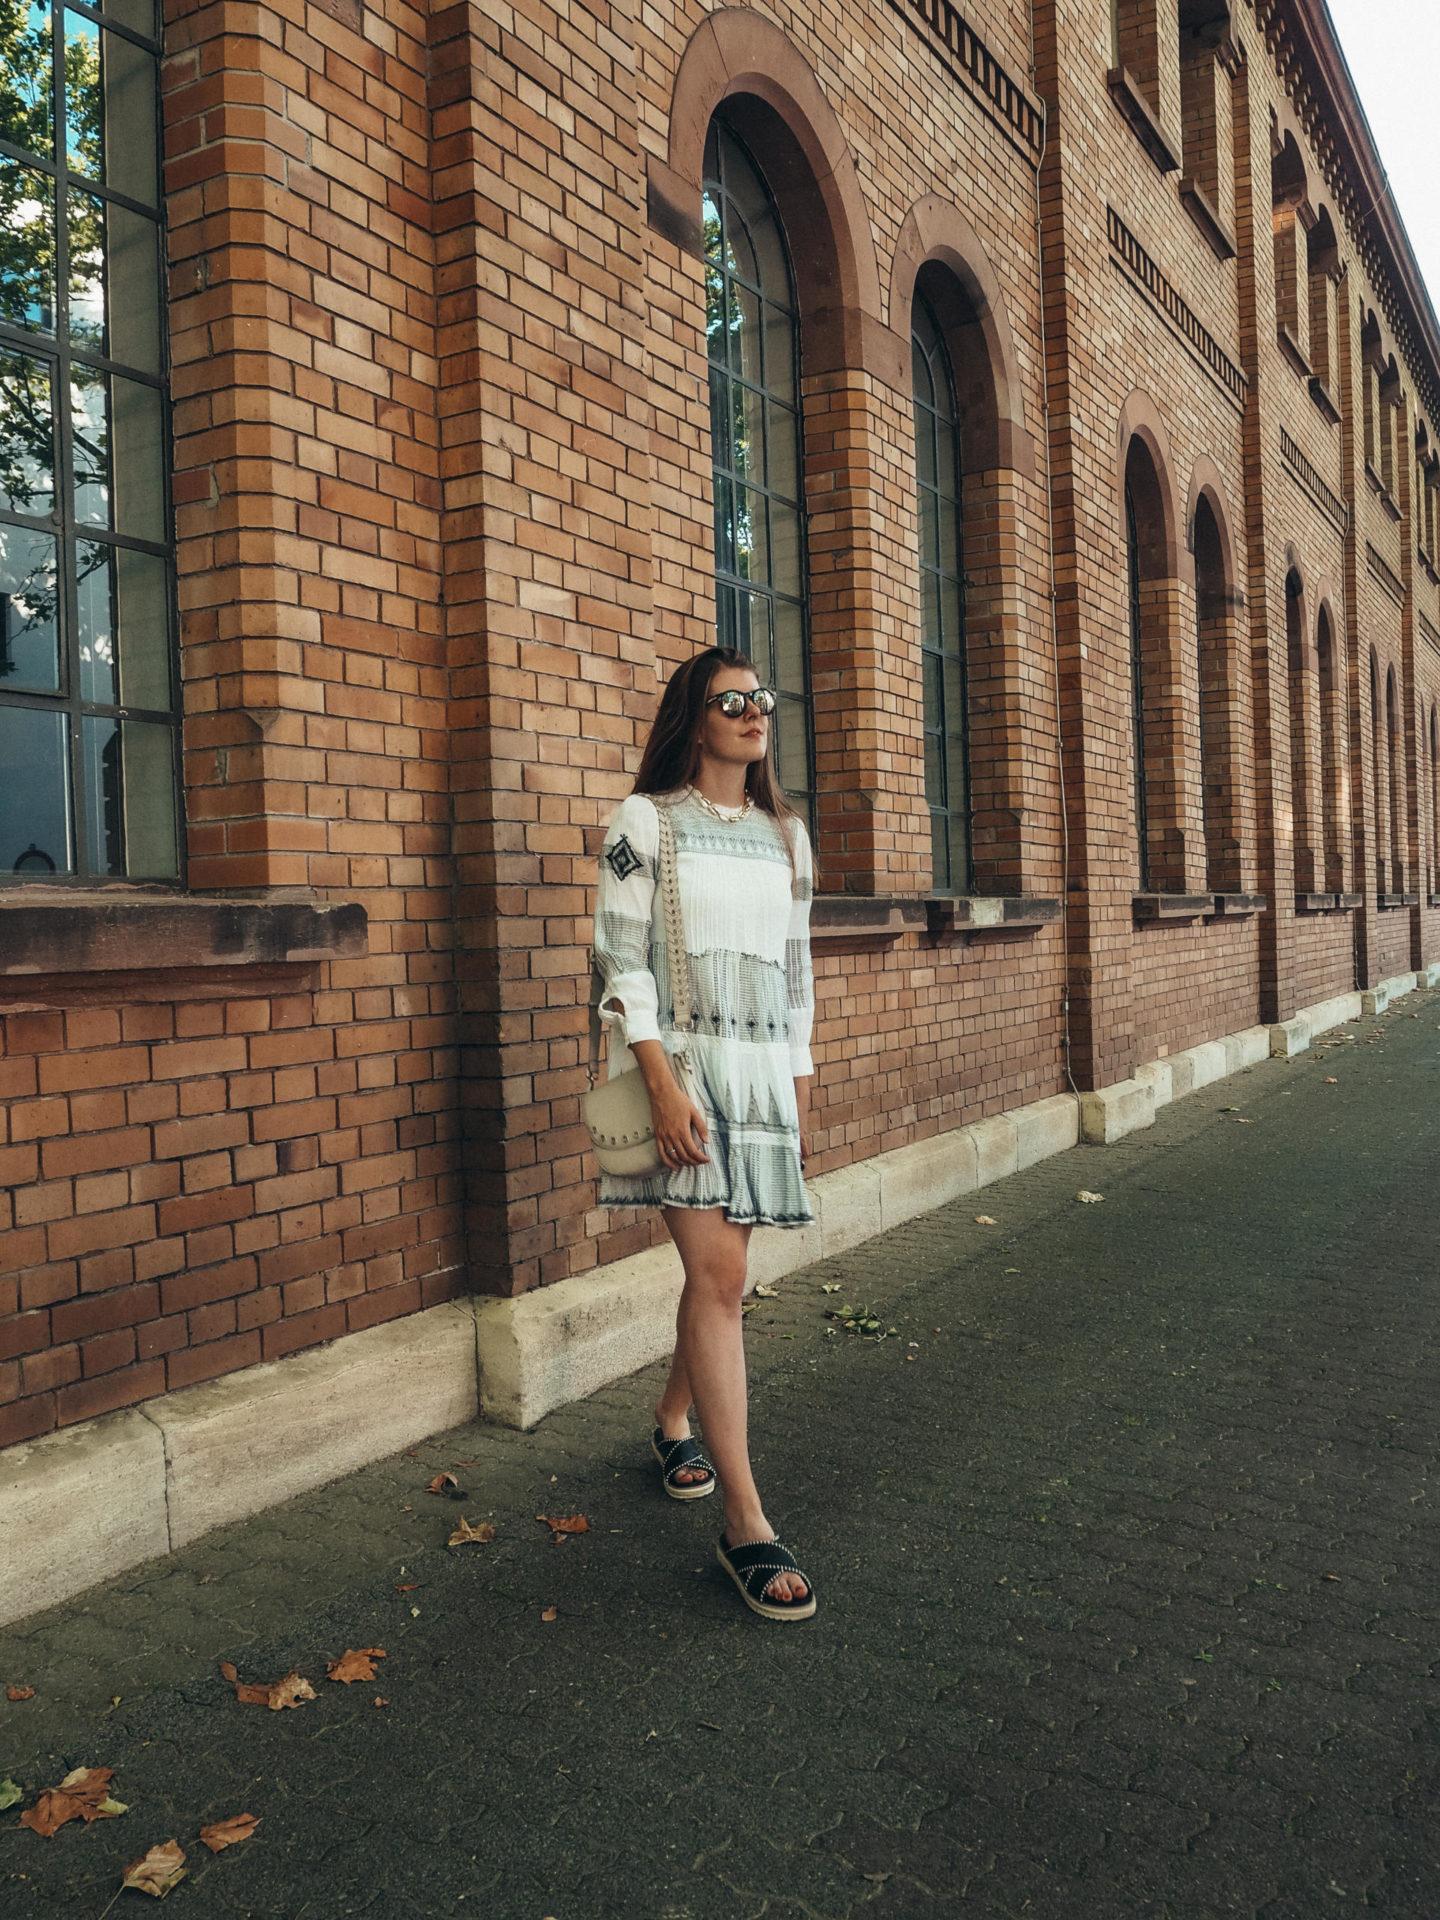 Sommerkleider Outfit Idee